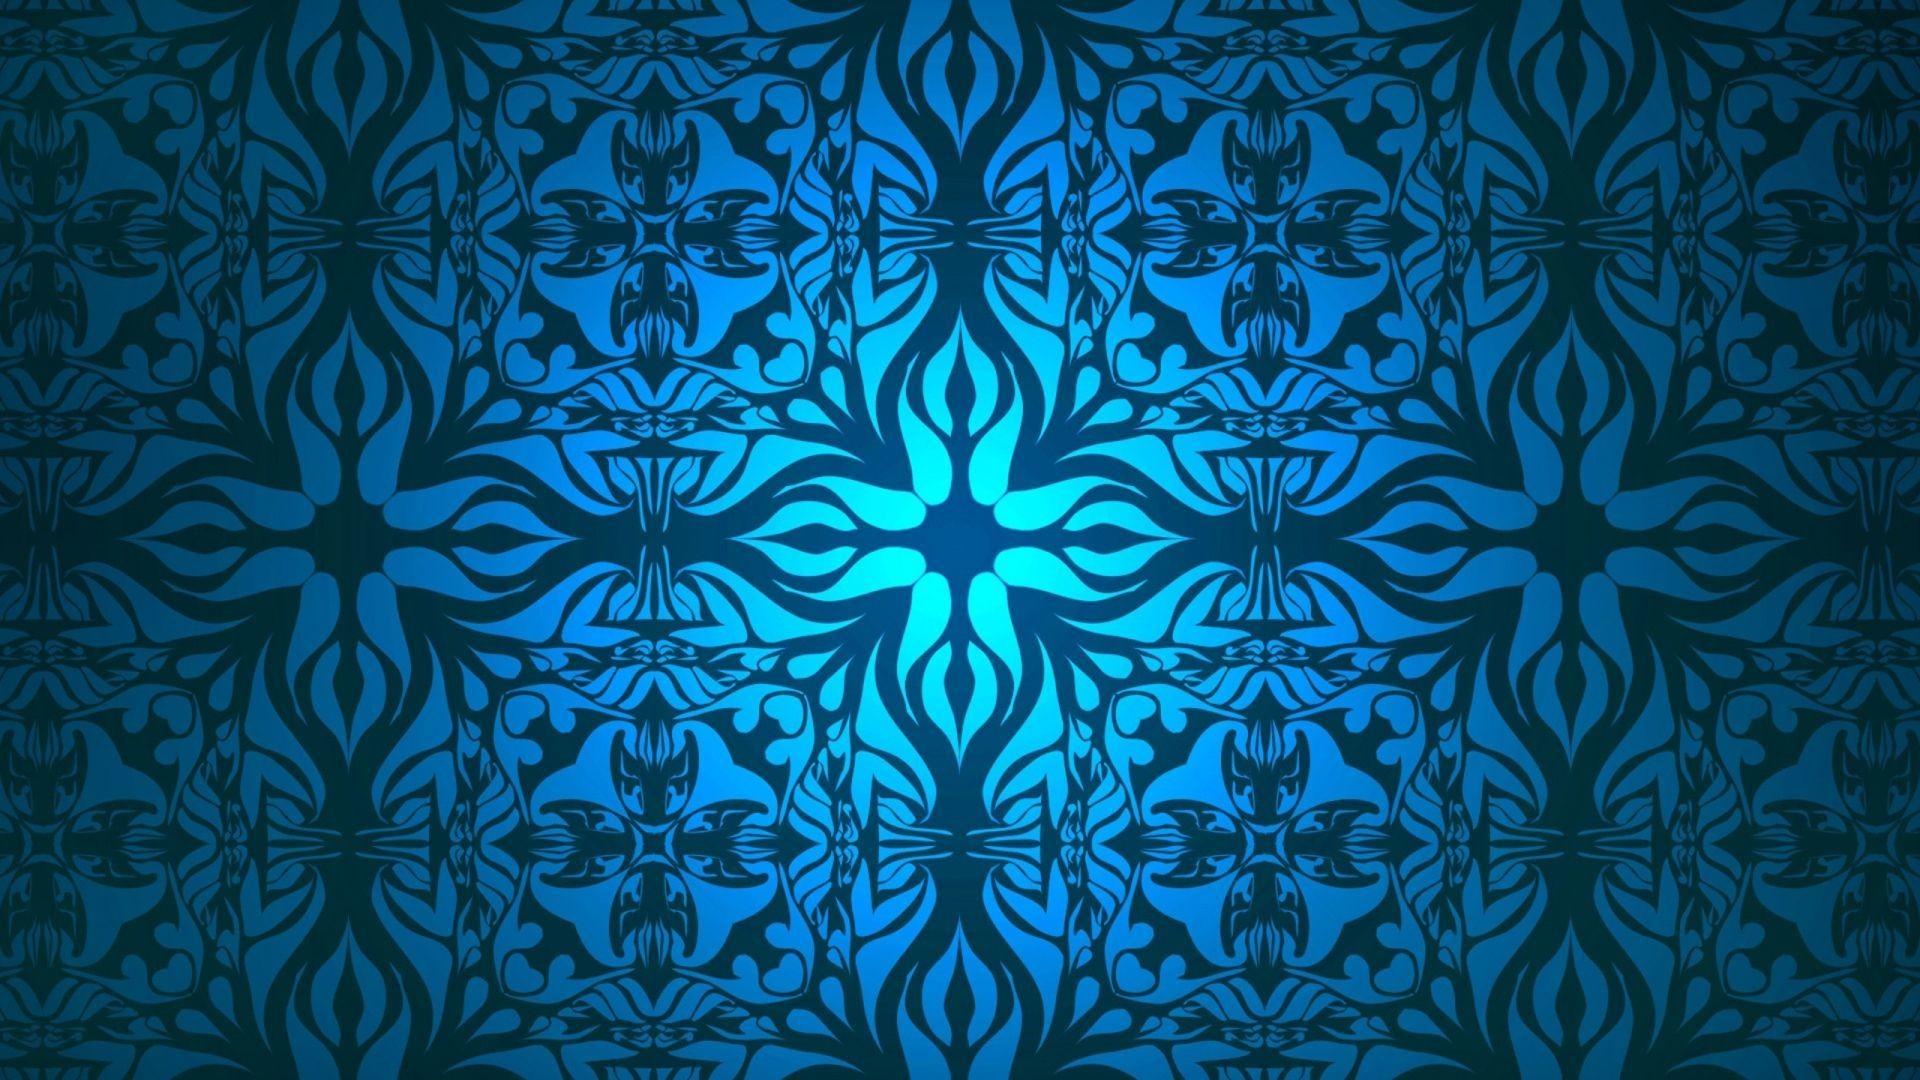 Download Wallpaper Patterns, Blue, White Full HD 1080p .